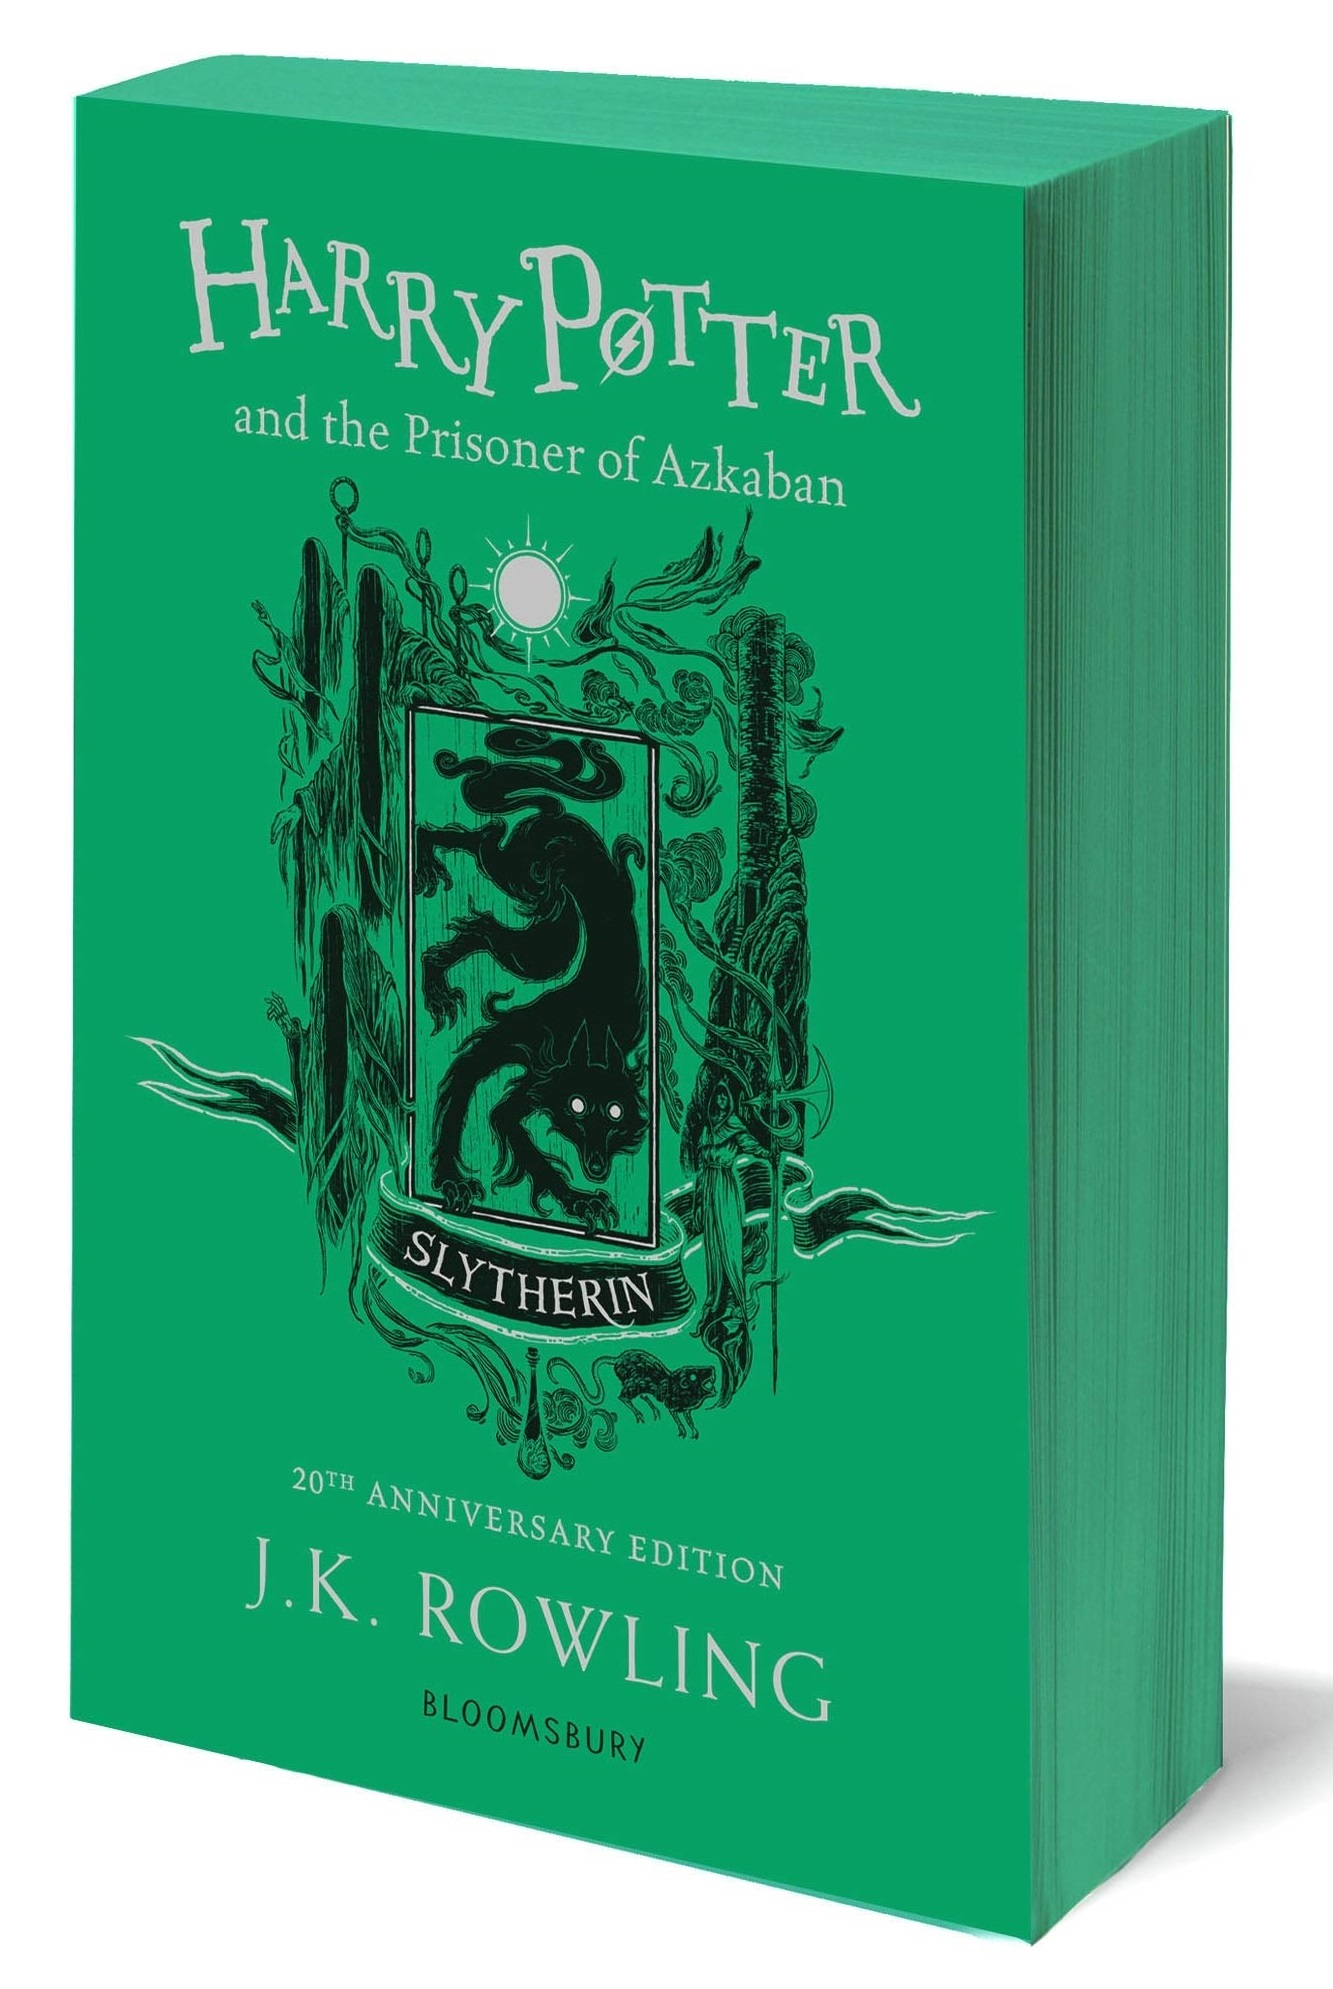 Harry Potter and the Prisoner of Azkaban: Slytherin Edition